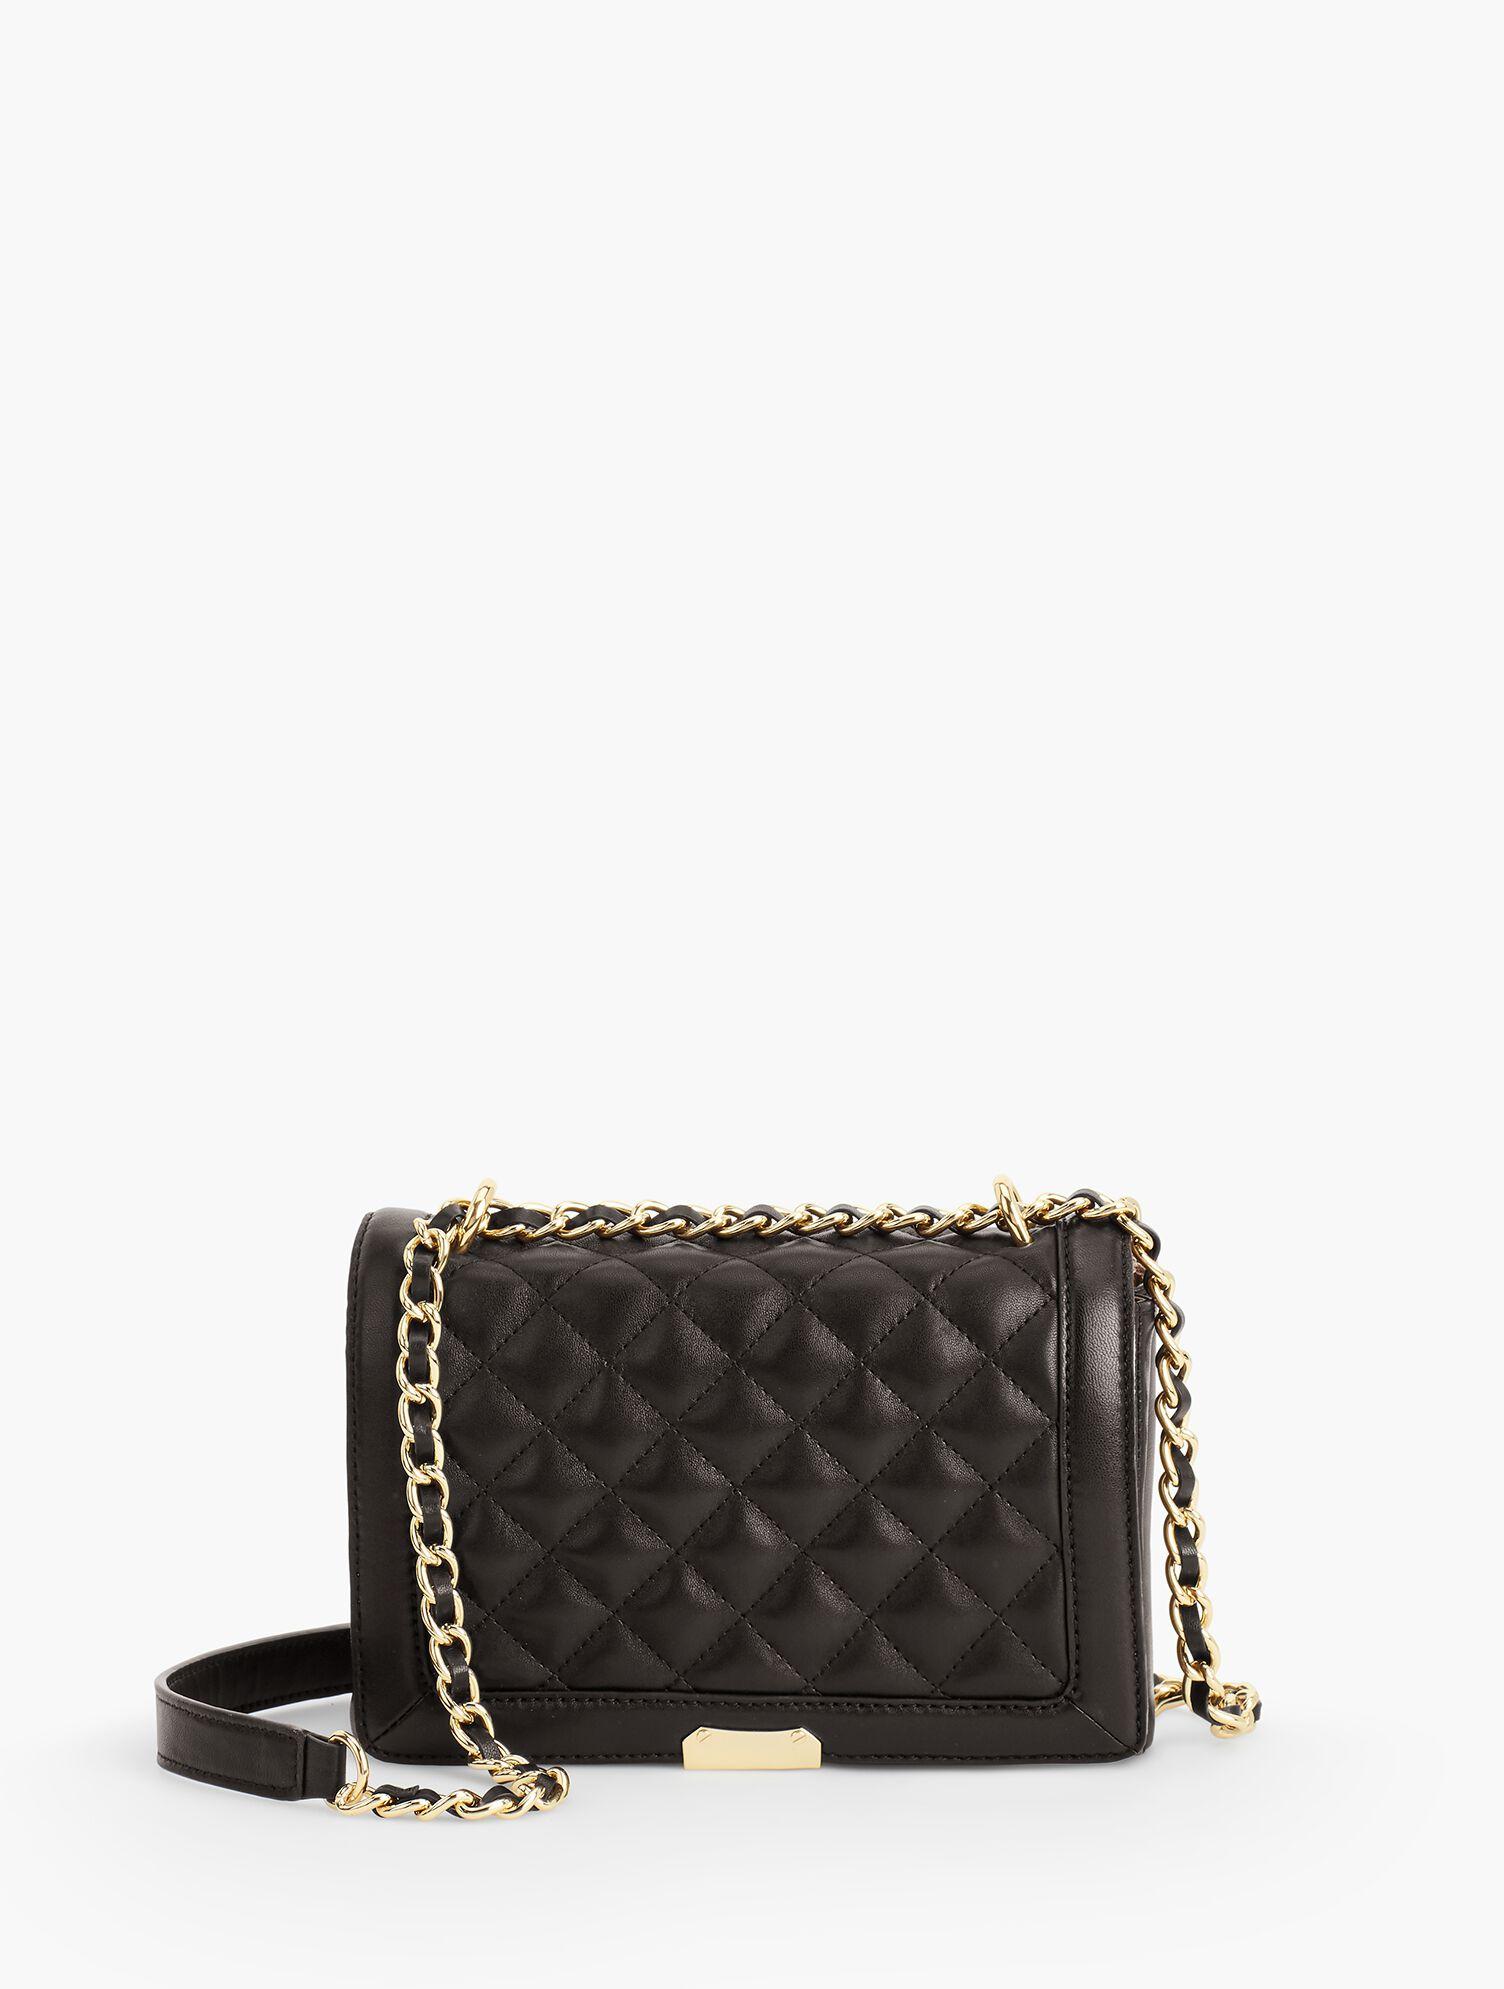 Quilted Chain-Strap Handbag | Talbots